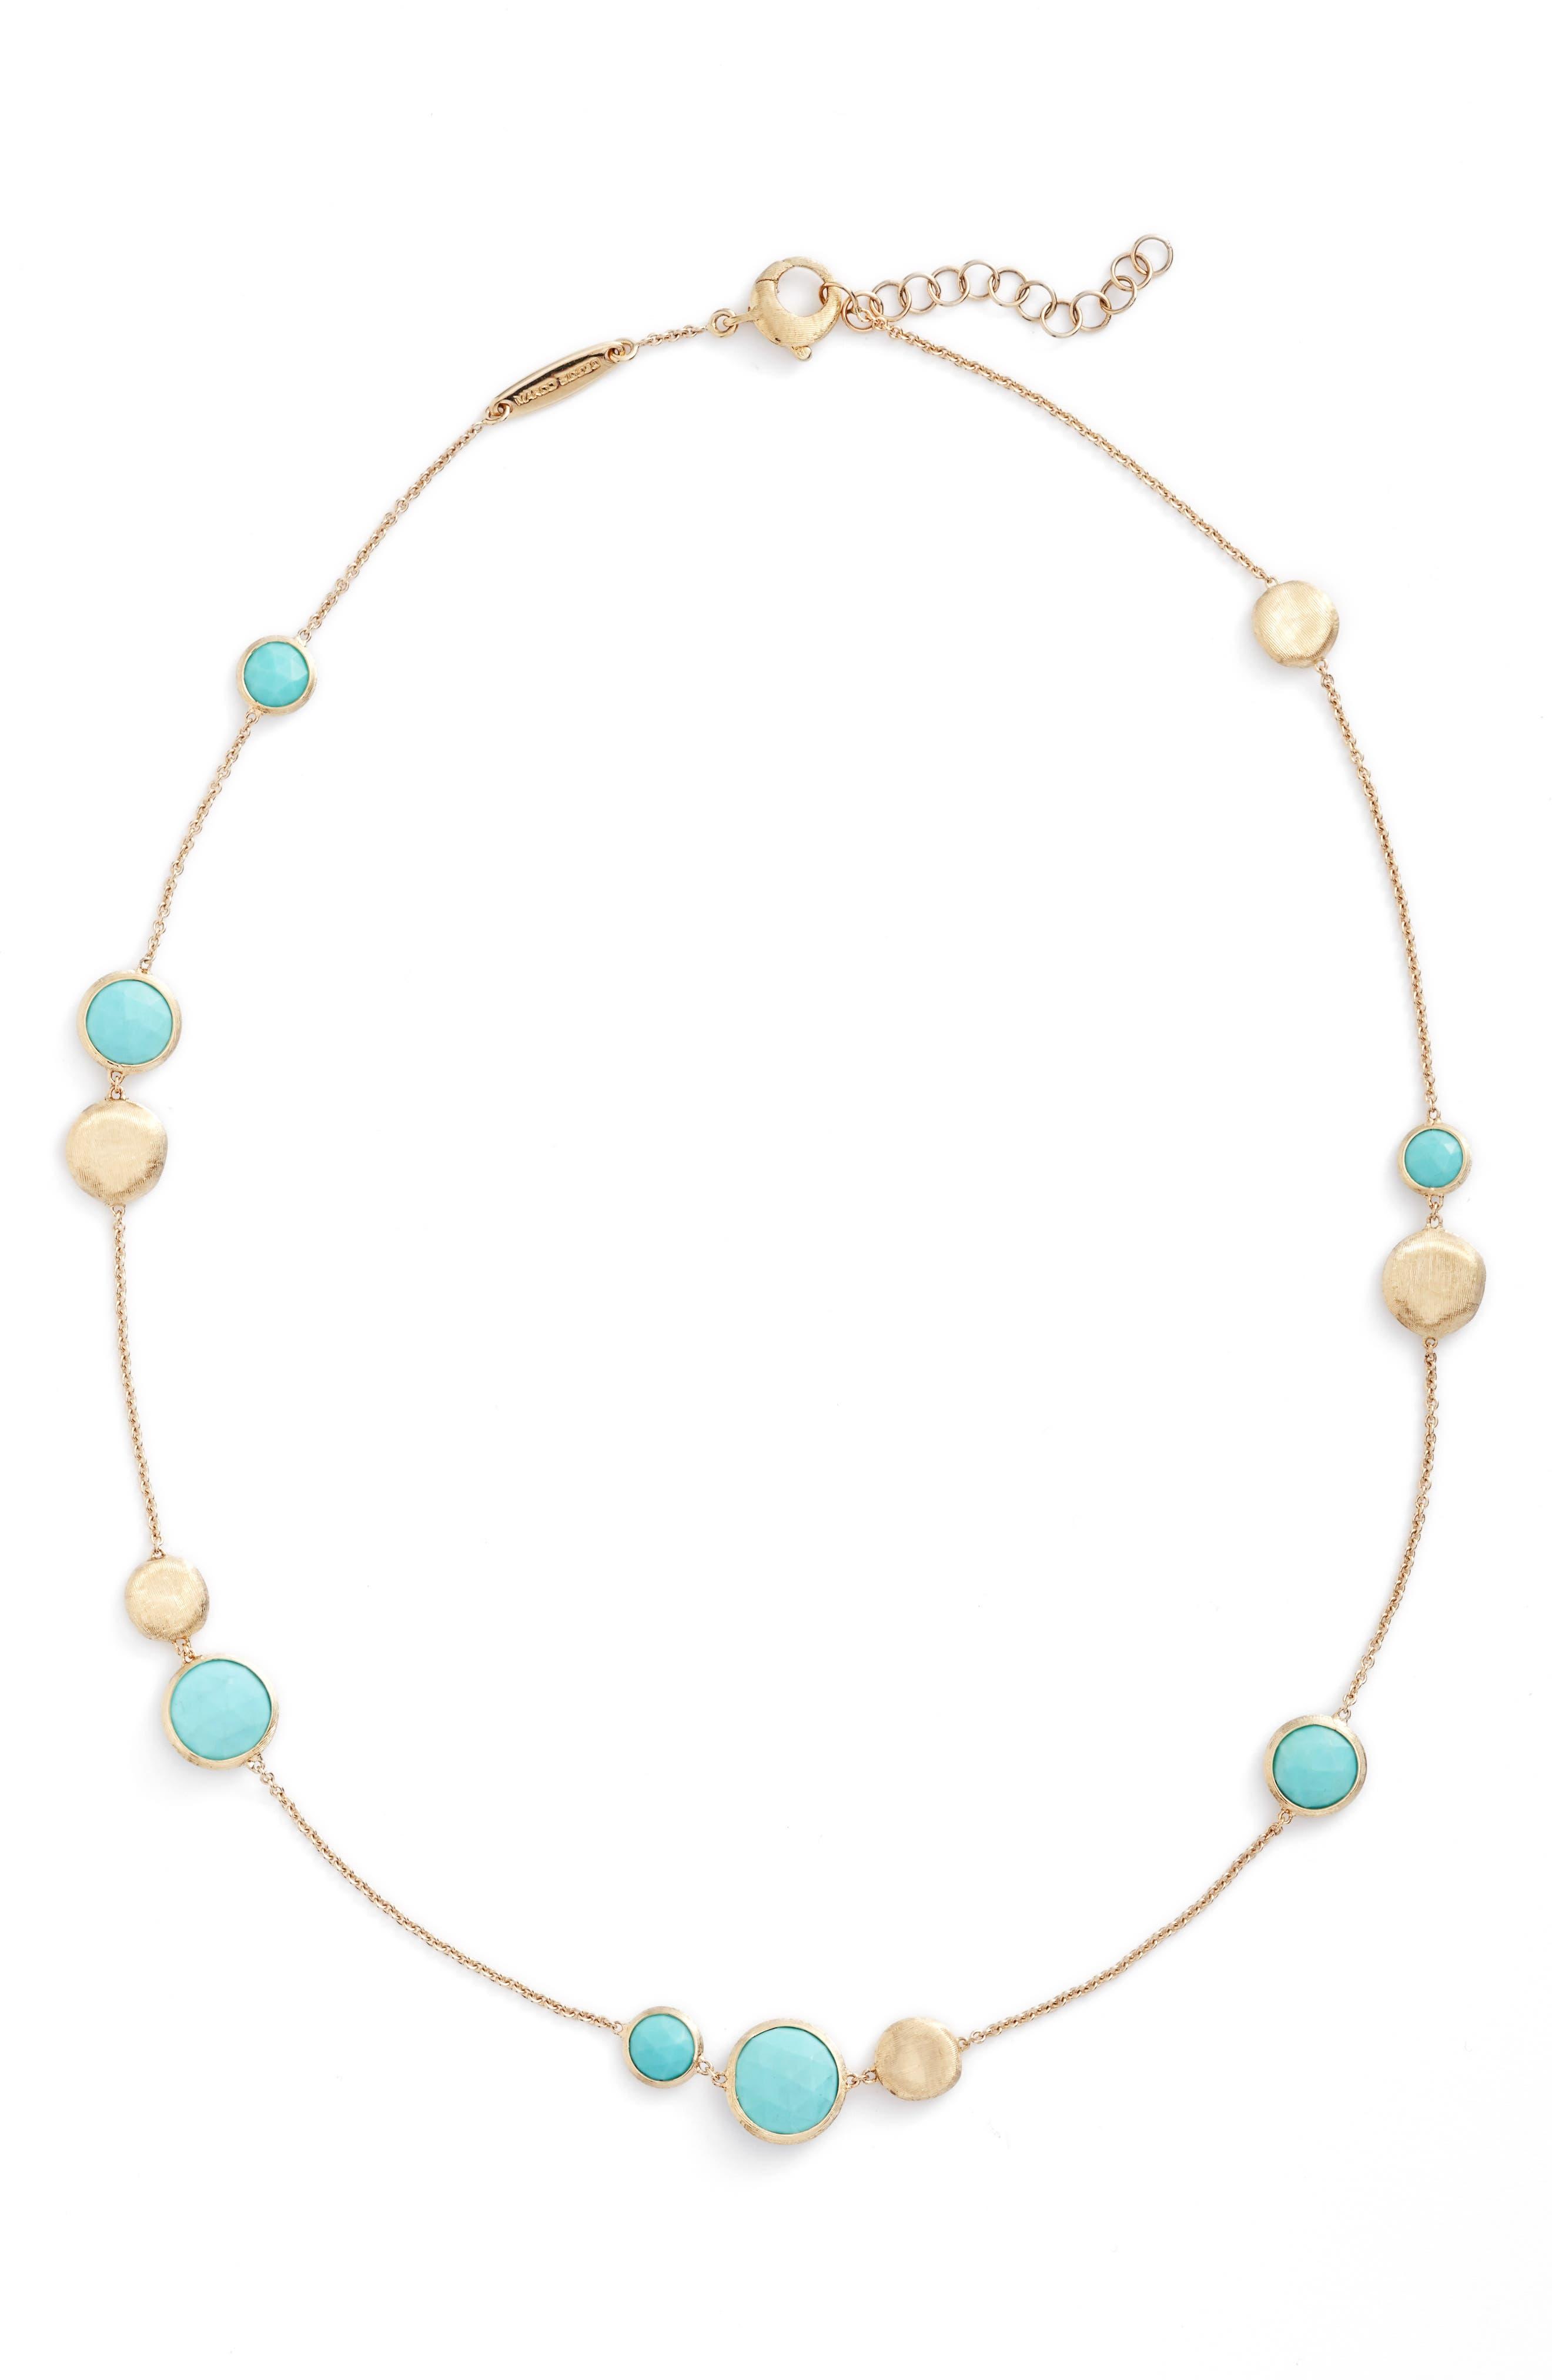 Jaipur Stone Collar Necklace,                             Main thumbnail 1, color,                             710